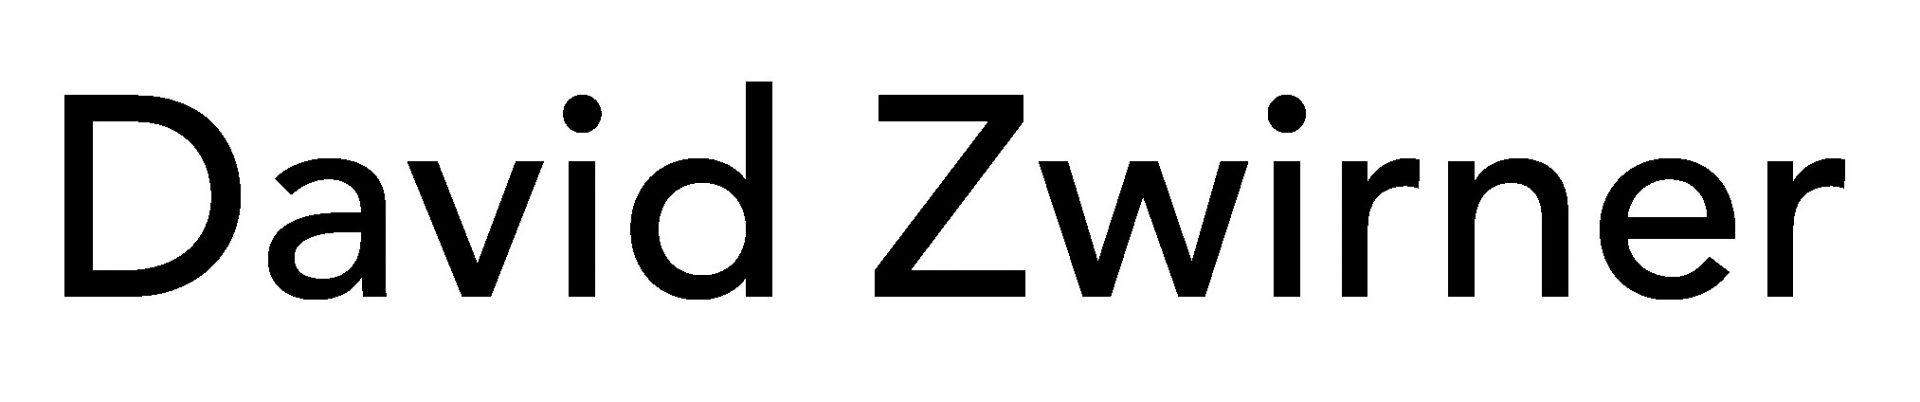 David-Zwirner-logo-1